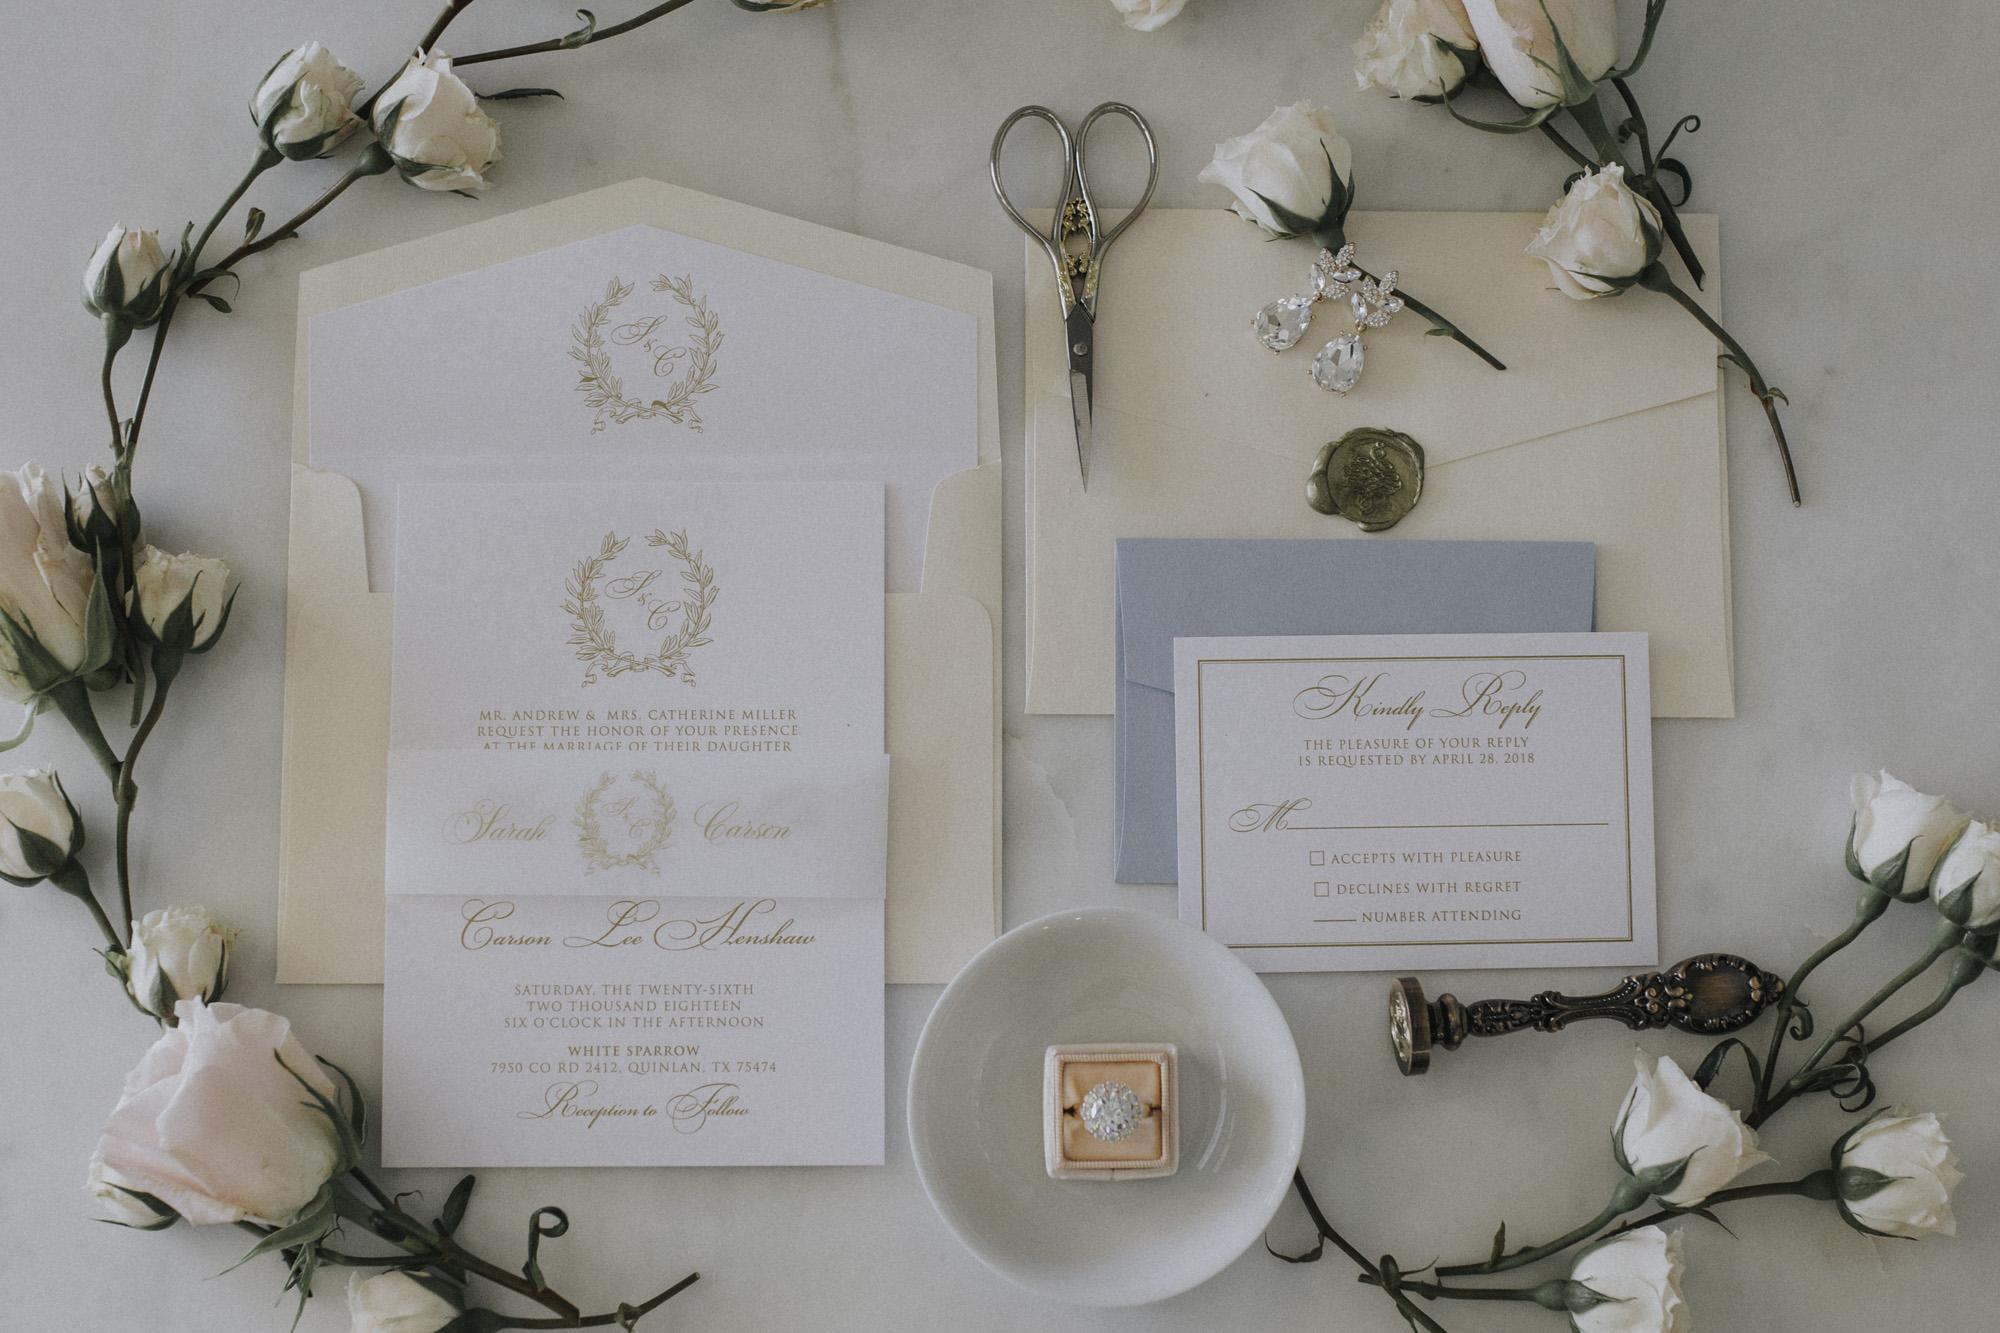 Cate_Ann_Photography_Dayton_Ohio_Wedding_Elopement_And_Engagement_PhotographerIMG_7896.jpg